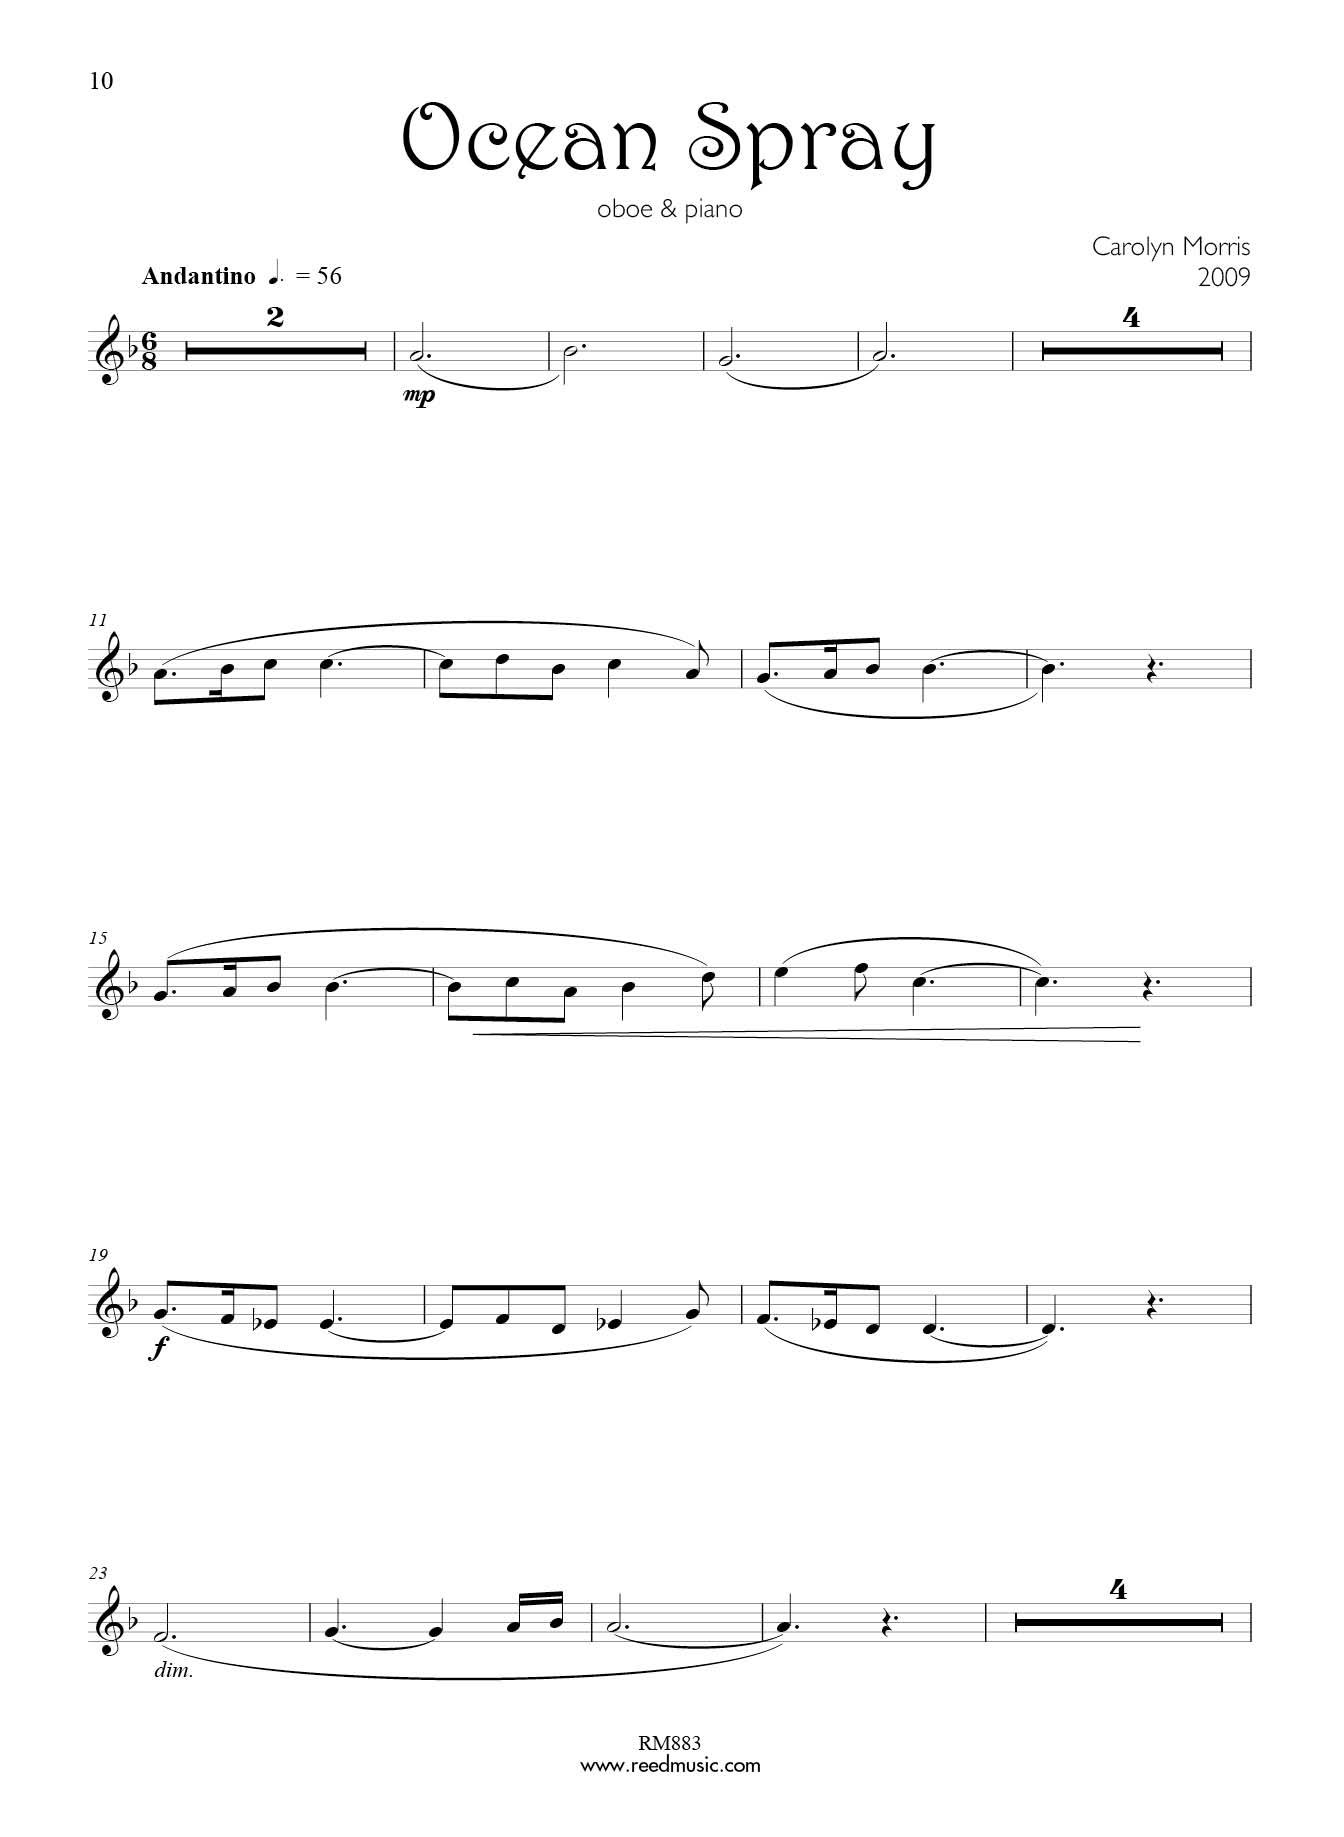 Exam: AMEB   Reed Music